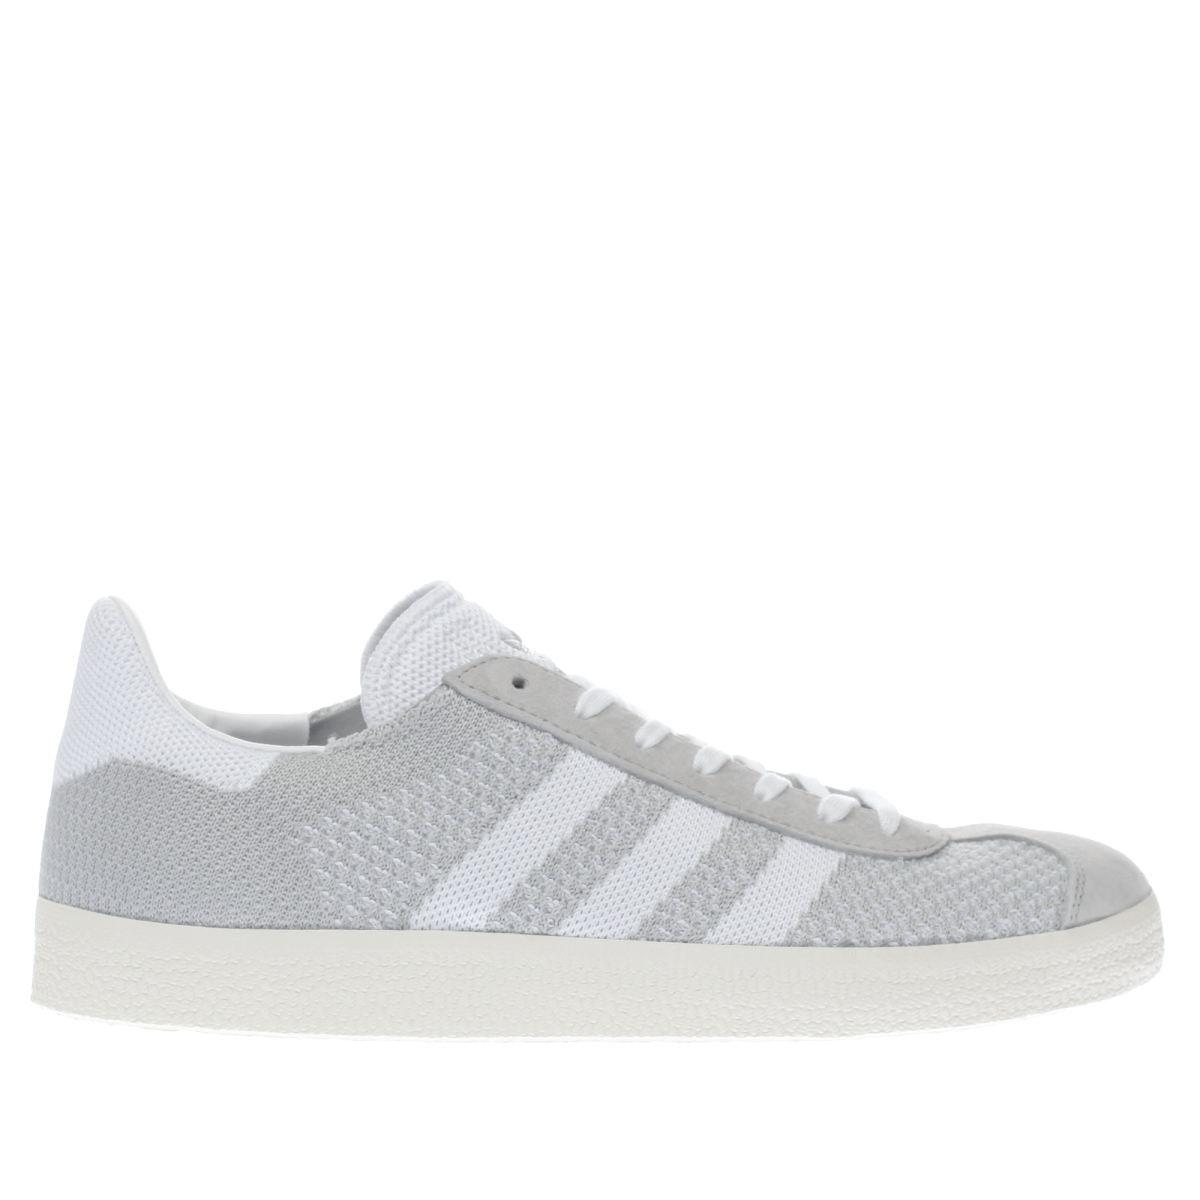 adidas light grey gazelle primeknit trainers